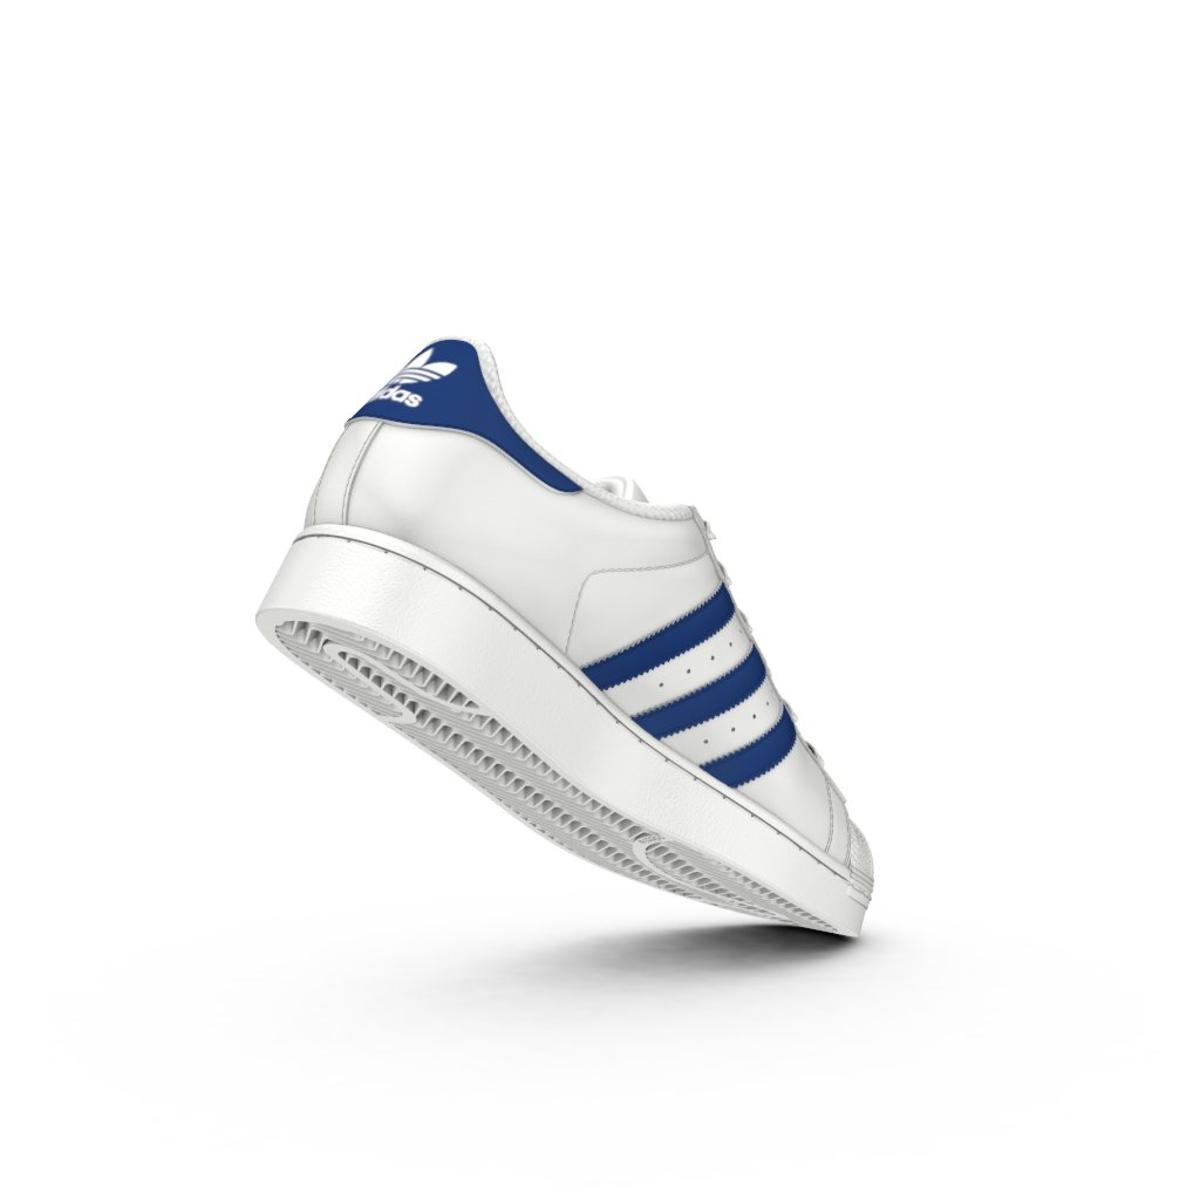 adidas superstar originals sneaker damen schuhe wei. Black Bedroom Furniture Sets. Home Design Ideas